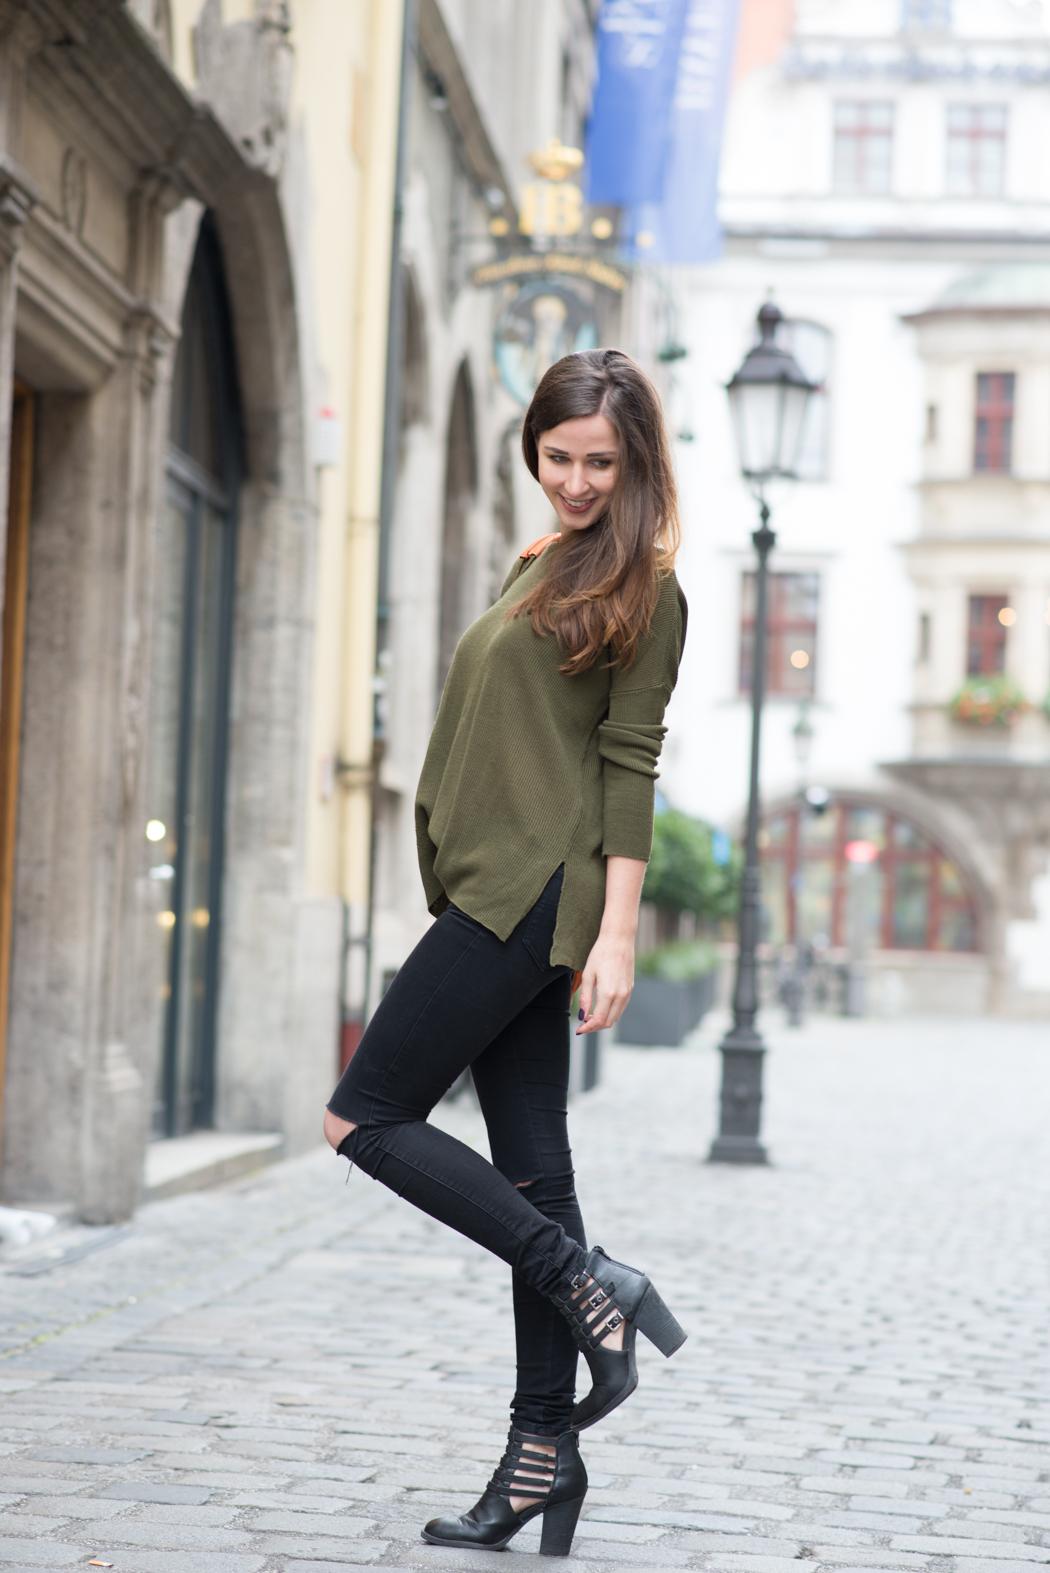 Münchner-Fashionblog-Alexander-Wang-Bag-Leomantel-8